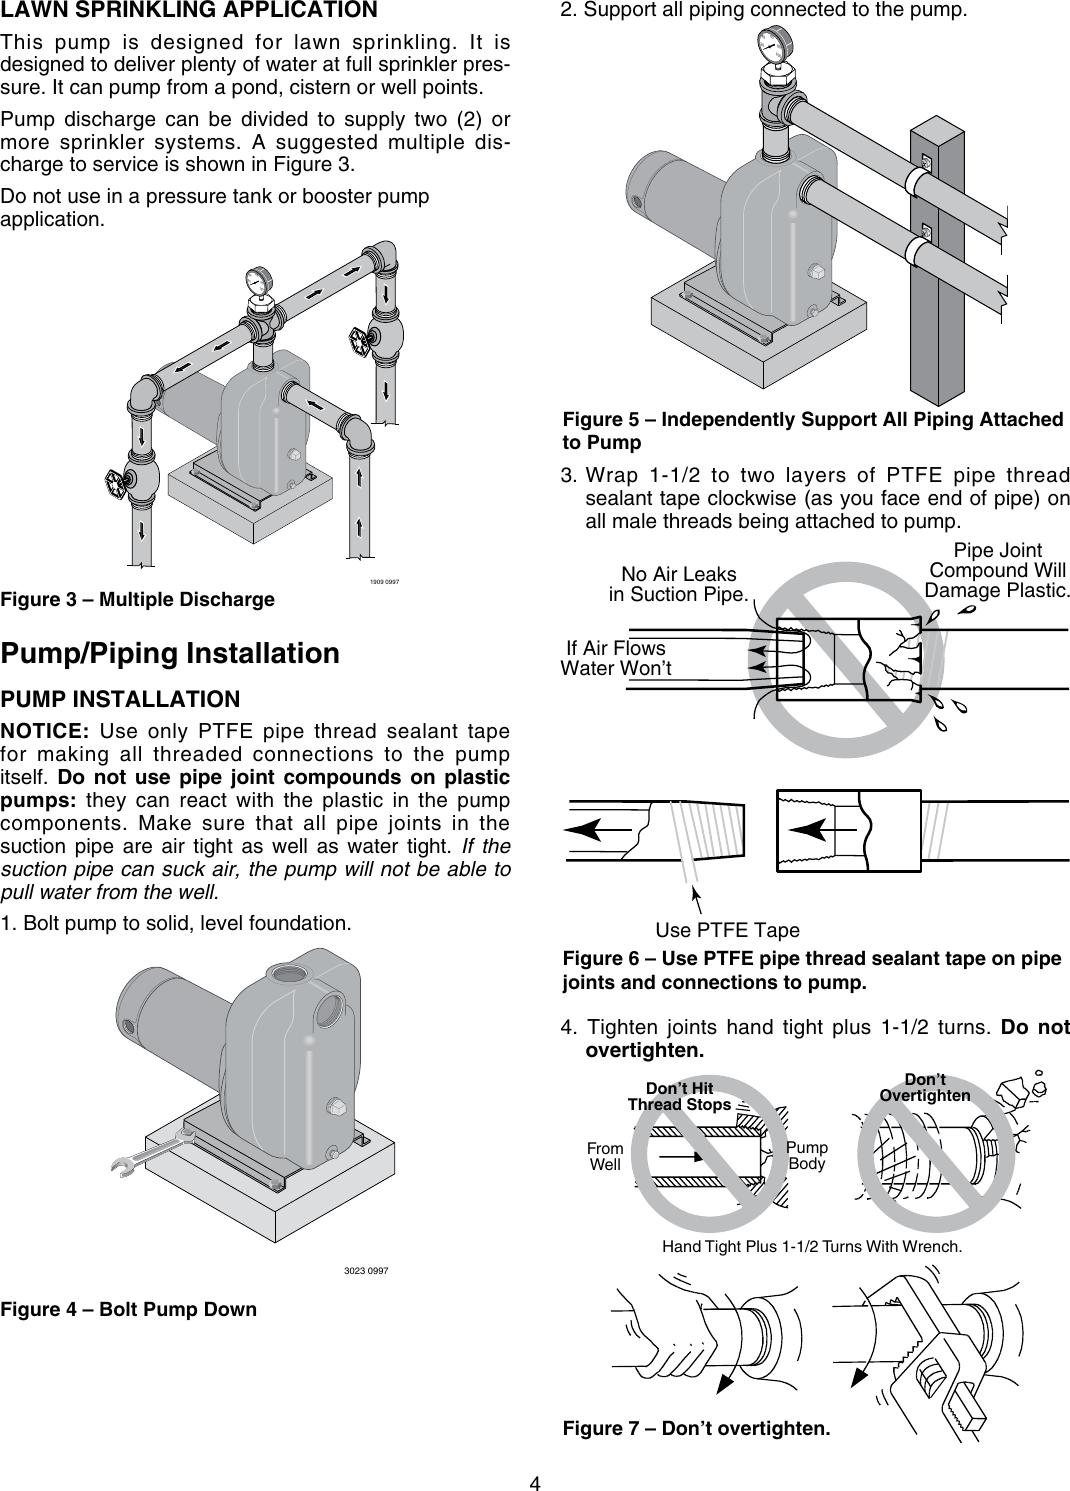 Sta-Rite Well Pump Wiring Diagram from usermanual.wiki